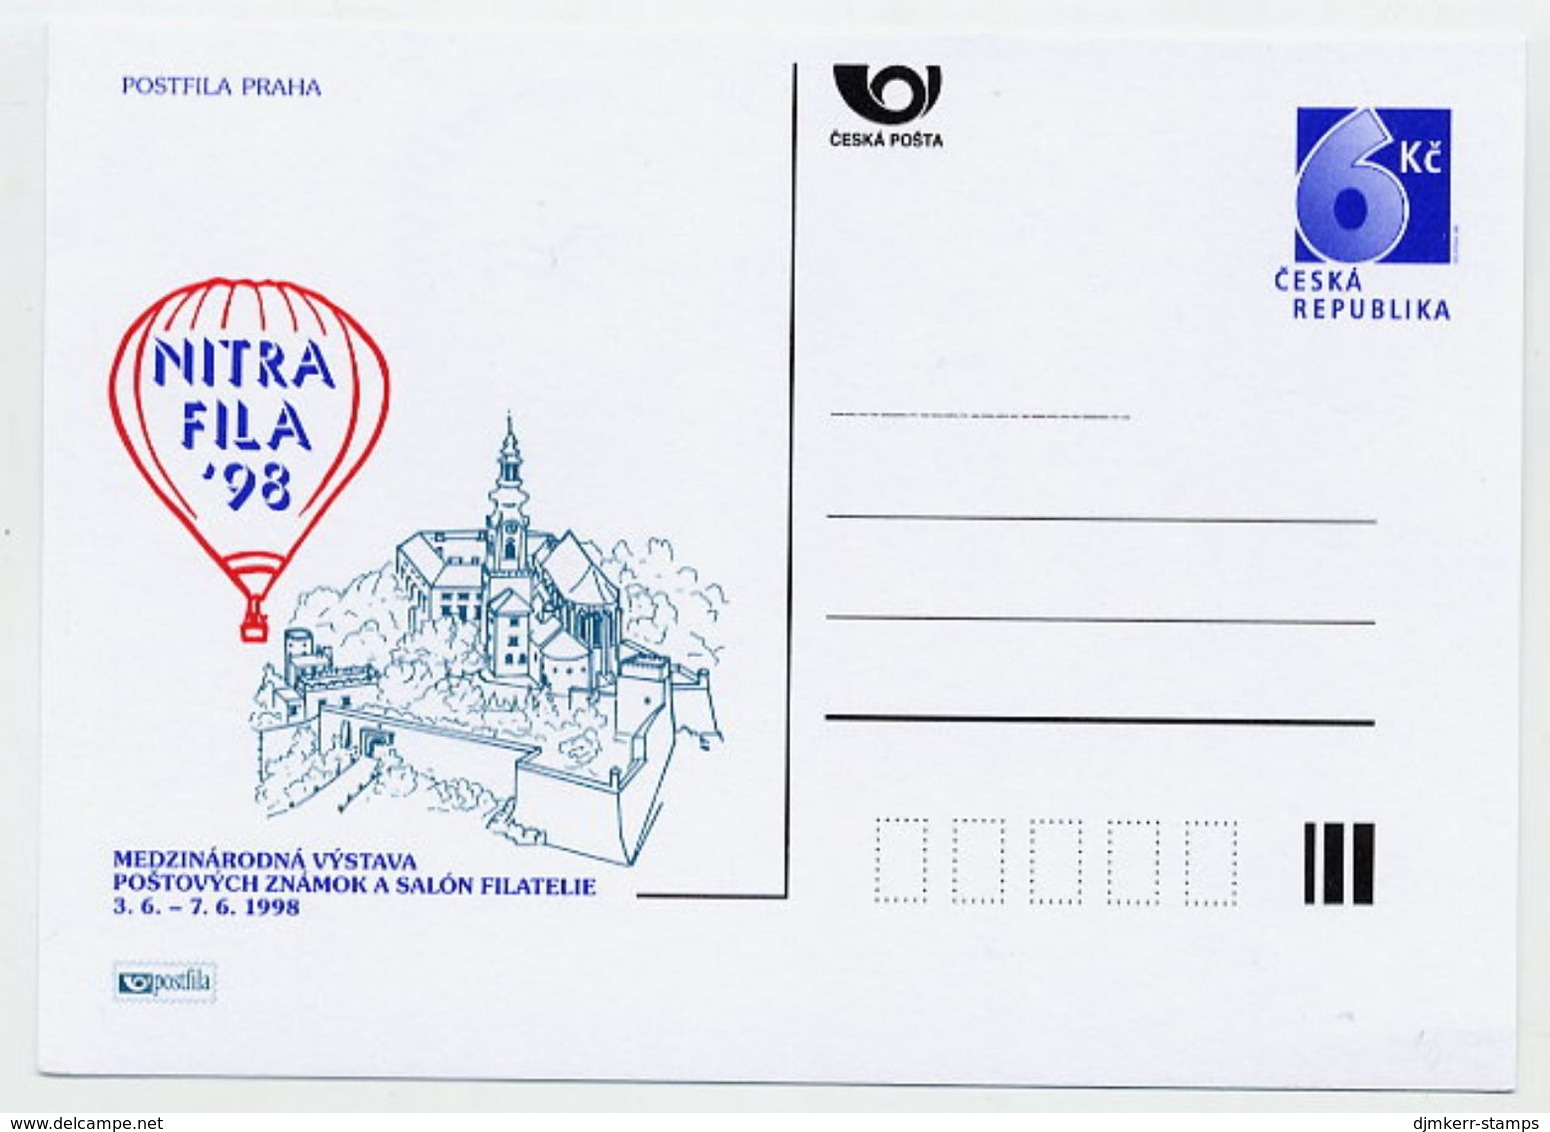 CZECH REPUBLIC 1998 6 Kc Postcard NITRAFILA '98  Unused.  Michel P40-A1 - Postal Stationery